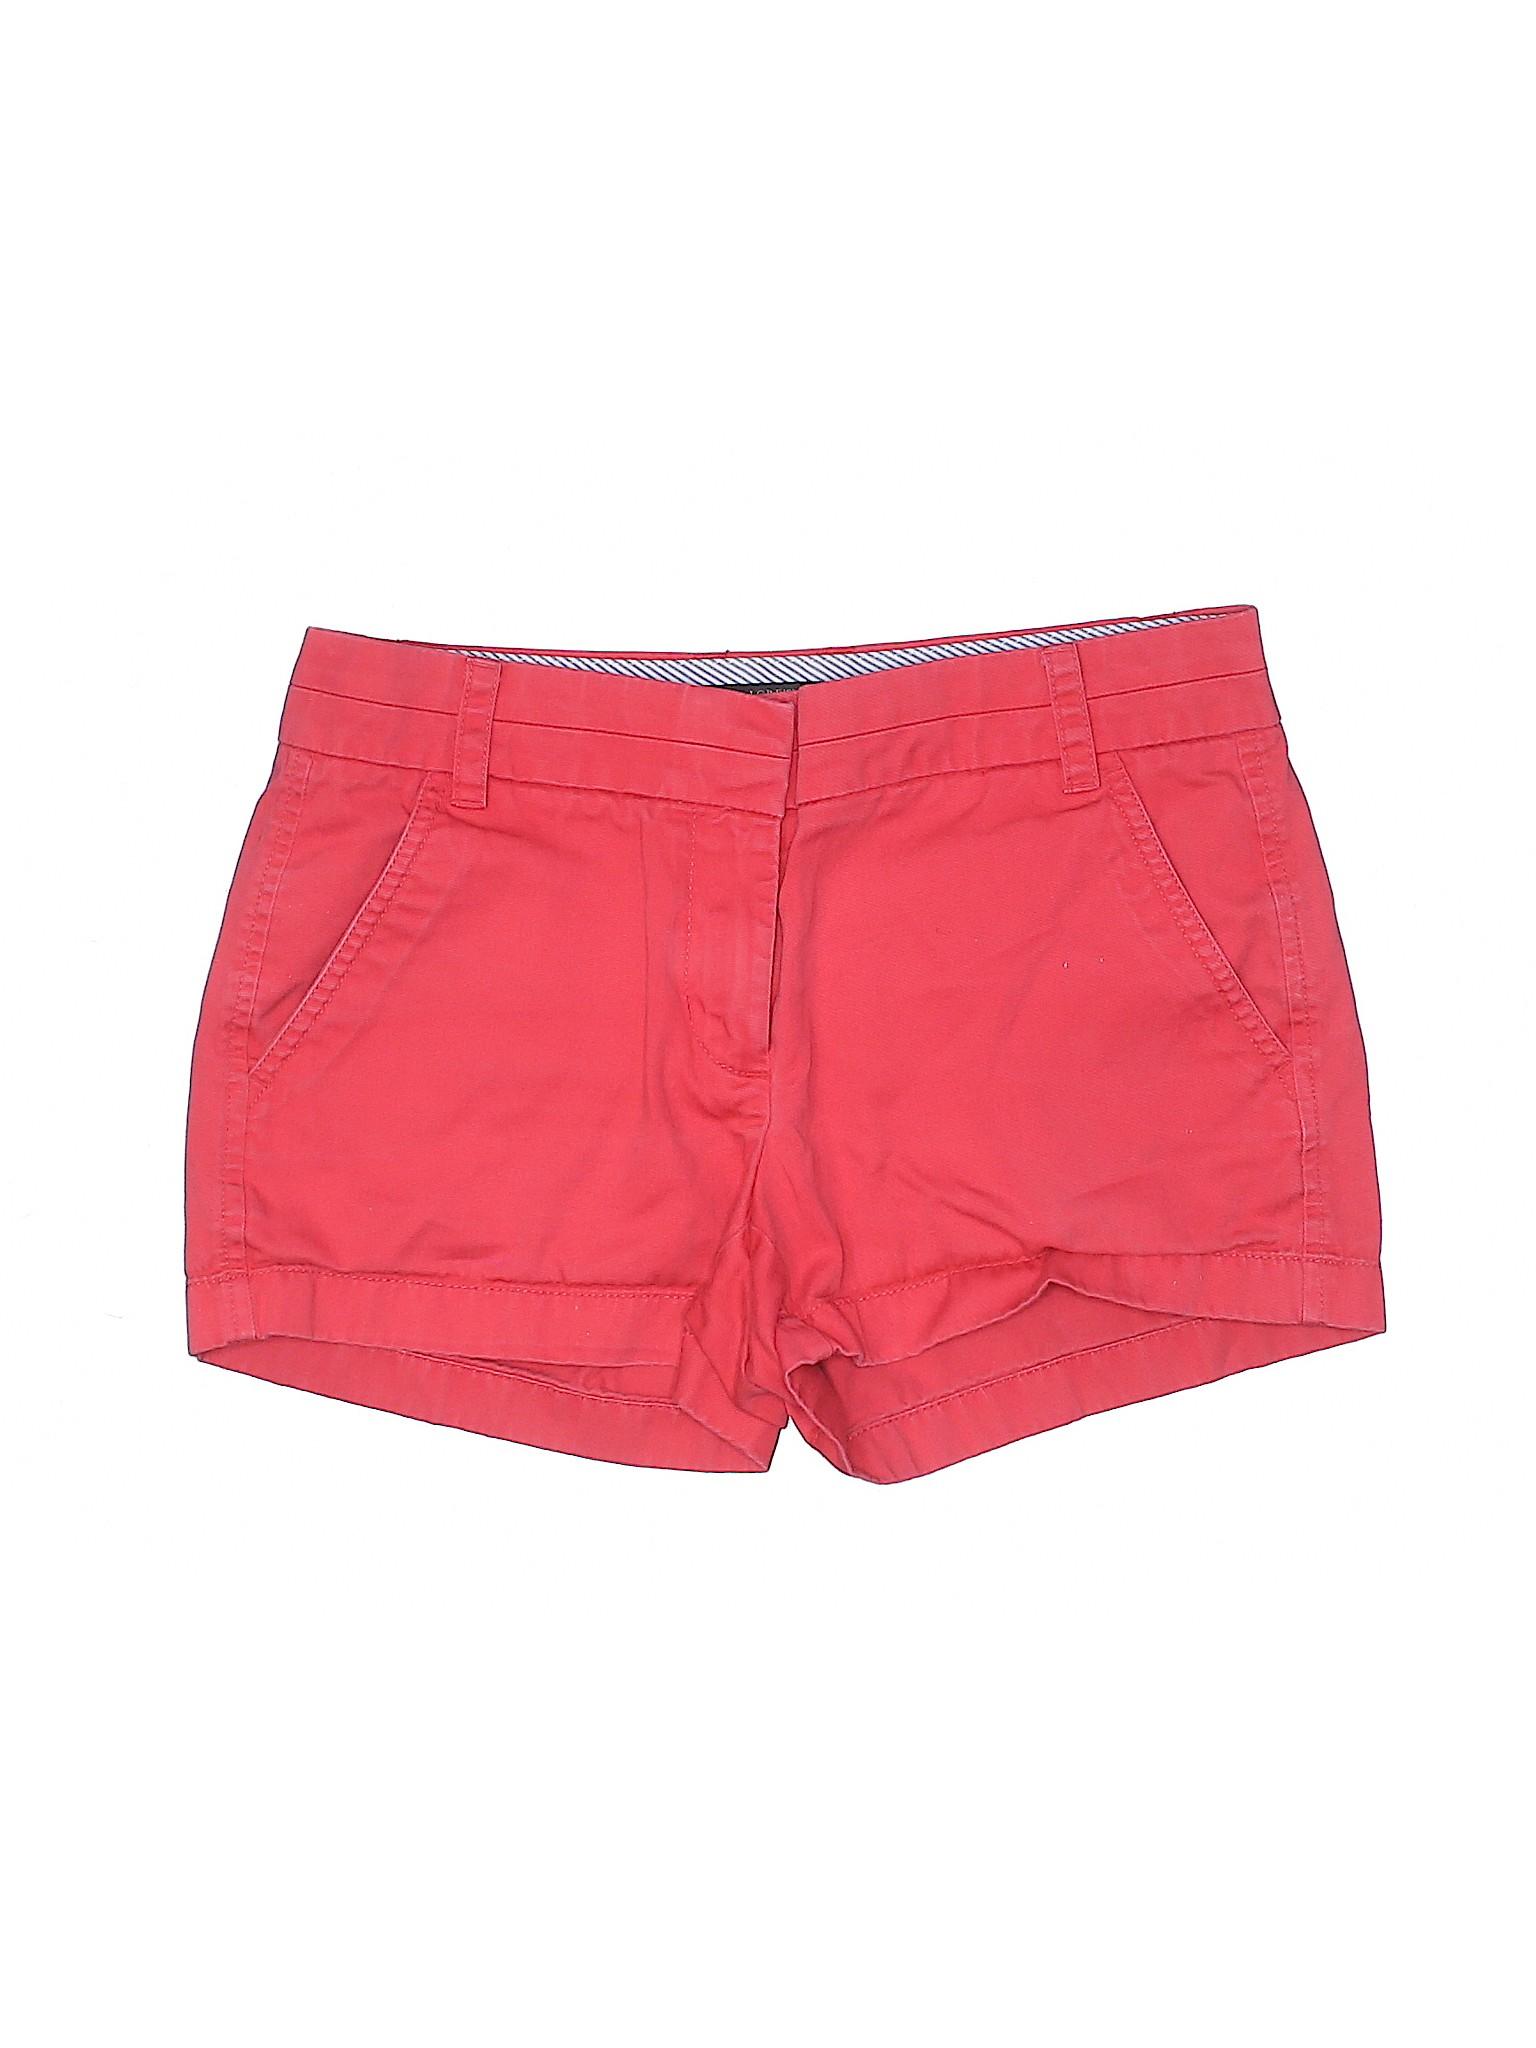 Shorts winter Khaki Boutique Crew J nAaqvxag